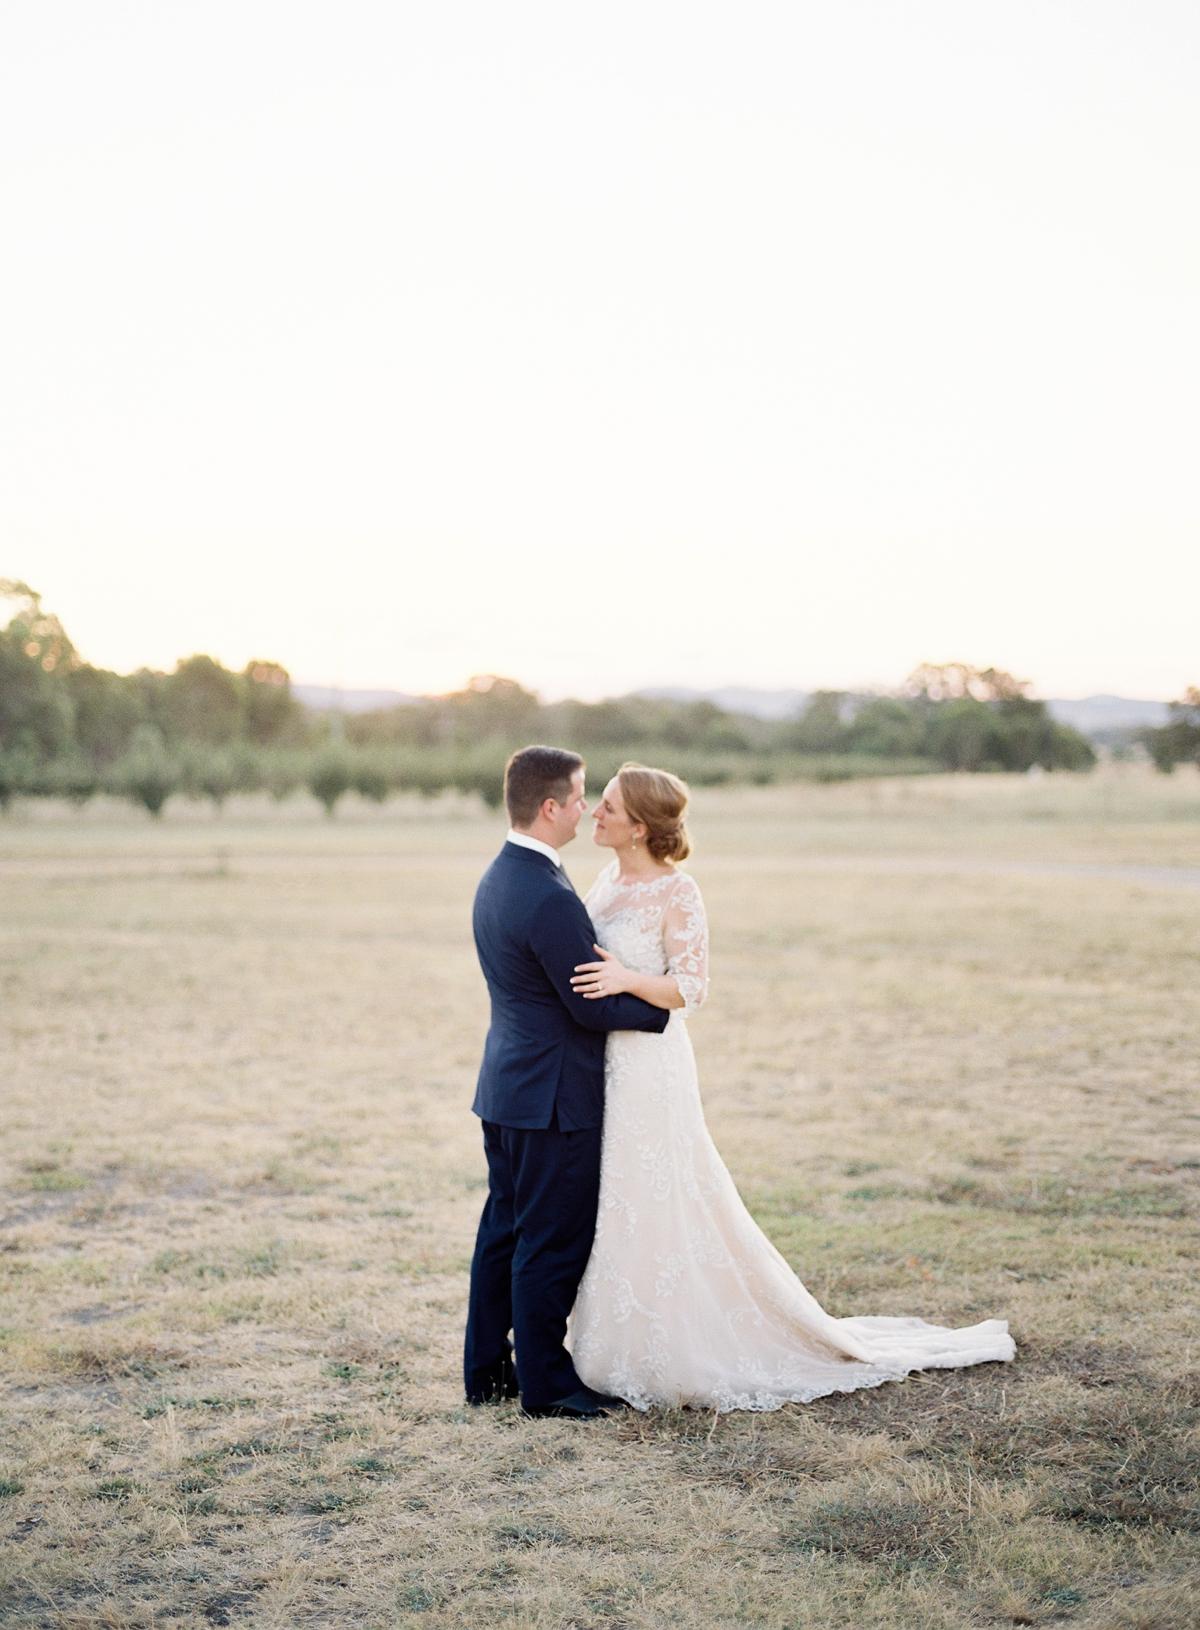 The Vine Grove Mudgee Wedding, Photography by Mr Edwards_1788.jpg